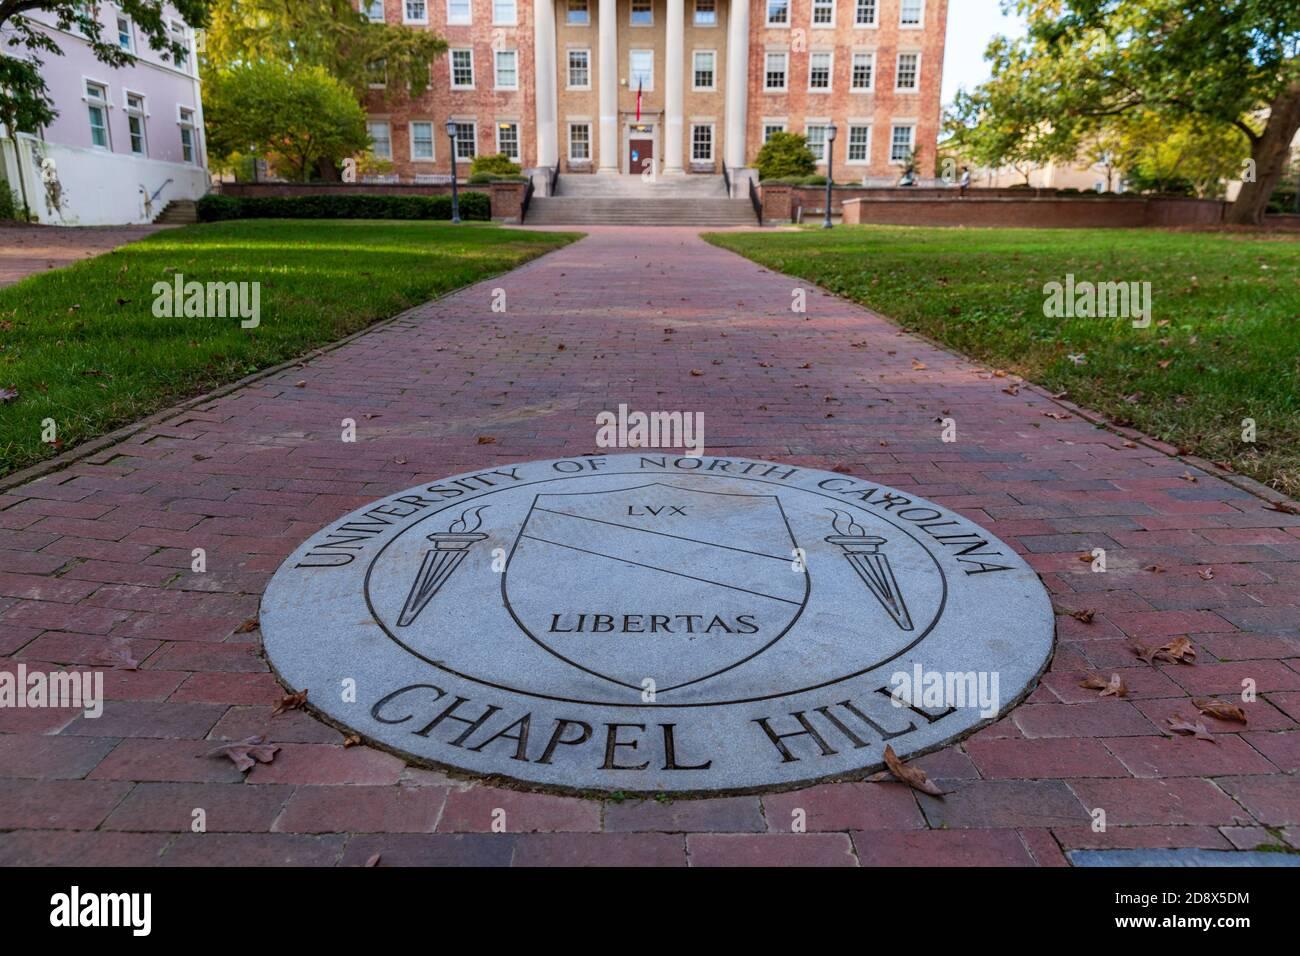 Chapel Hill, NC / USA - October 21, 2020: The University of North Carolina Chapel Hill Seal in brick walk way. Stock Photo